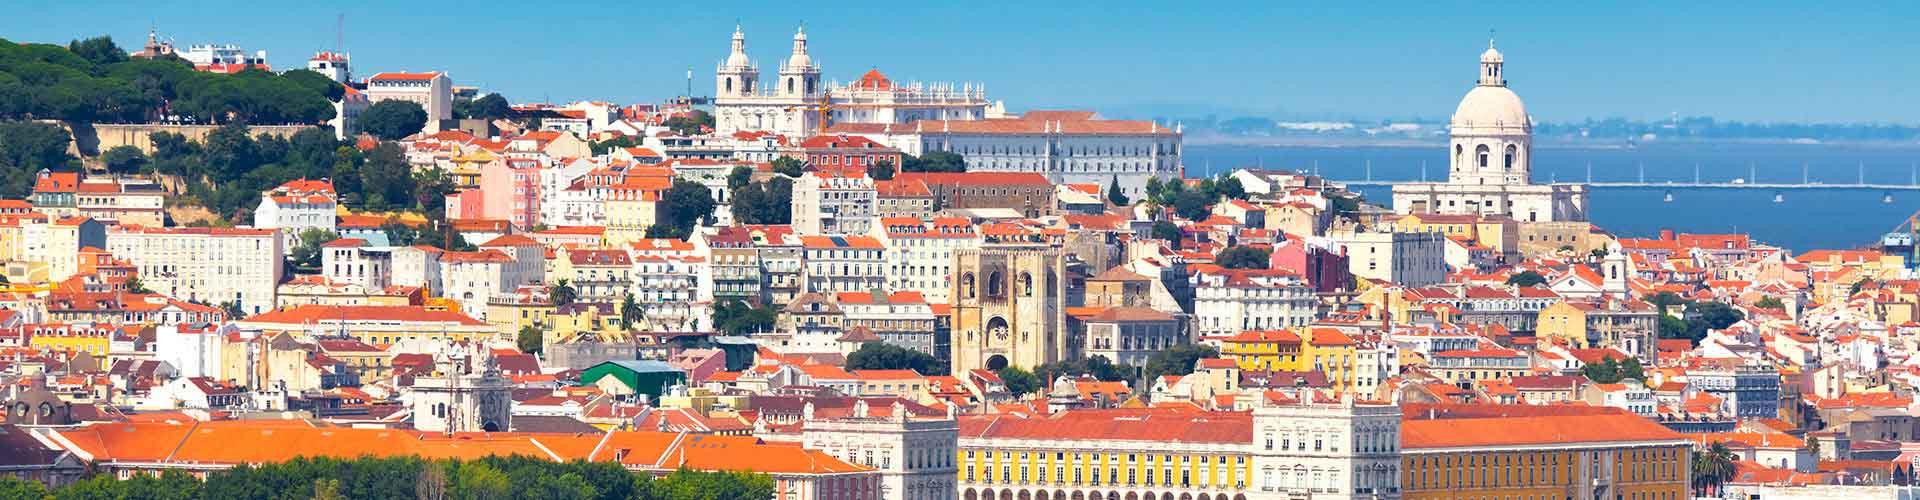 Lisboa - Hostales en Lisboa. Mapas de Lisboa, Fotos y comentarios de cada Hostal en Lisboa.